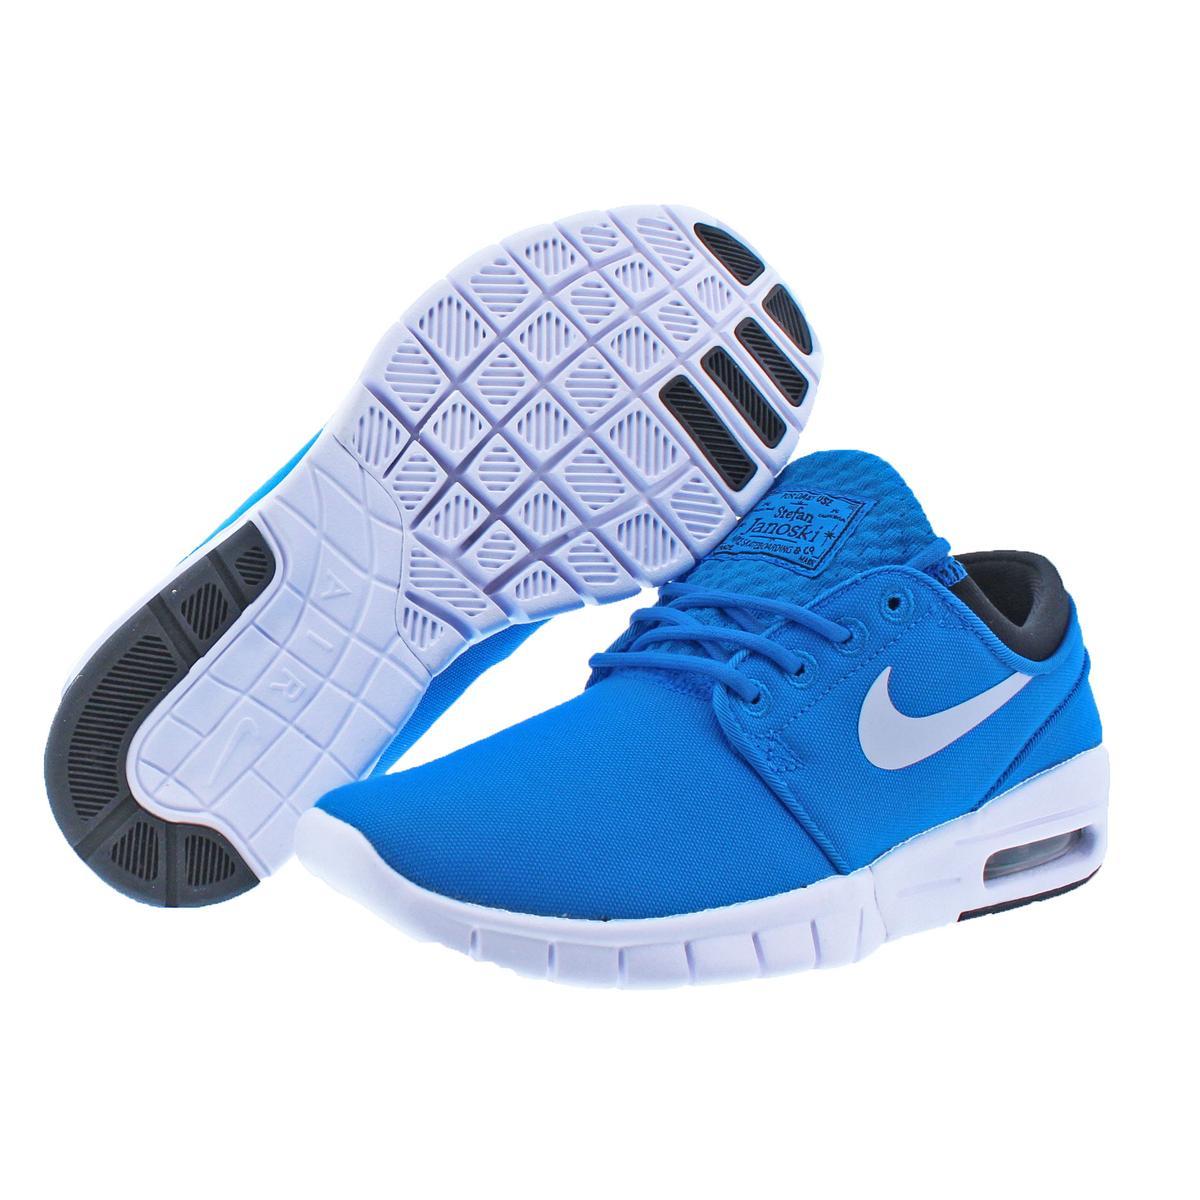 Nike-Mens-Stefan-Mesh-Signature-Sport-Athletic-Shoes-Sneakers-BHFO-9704